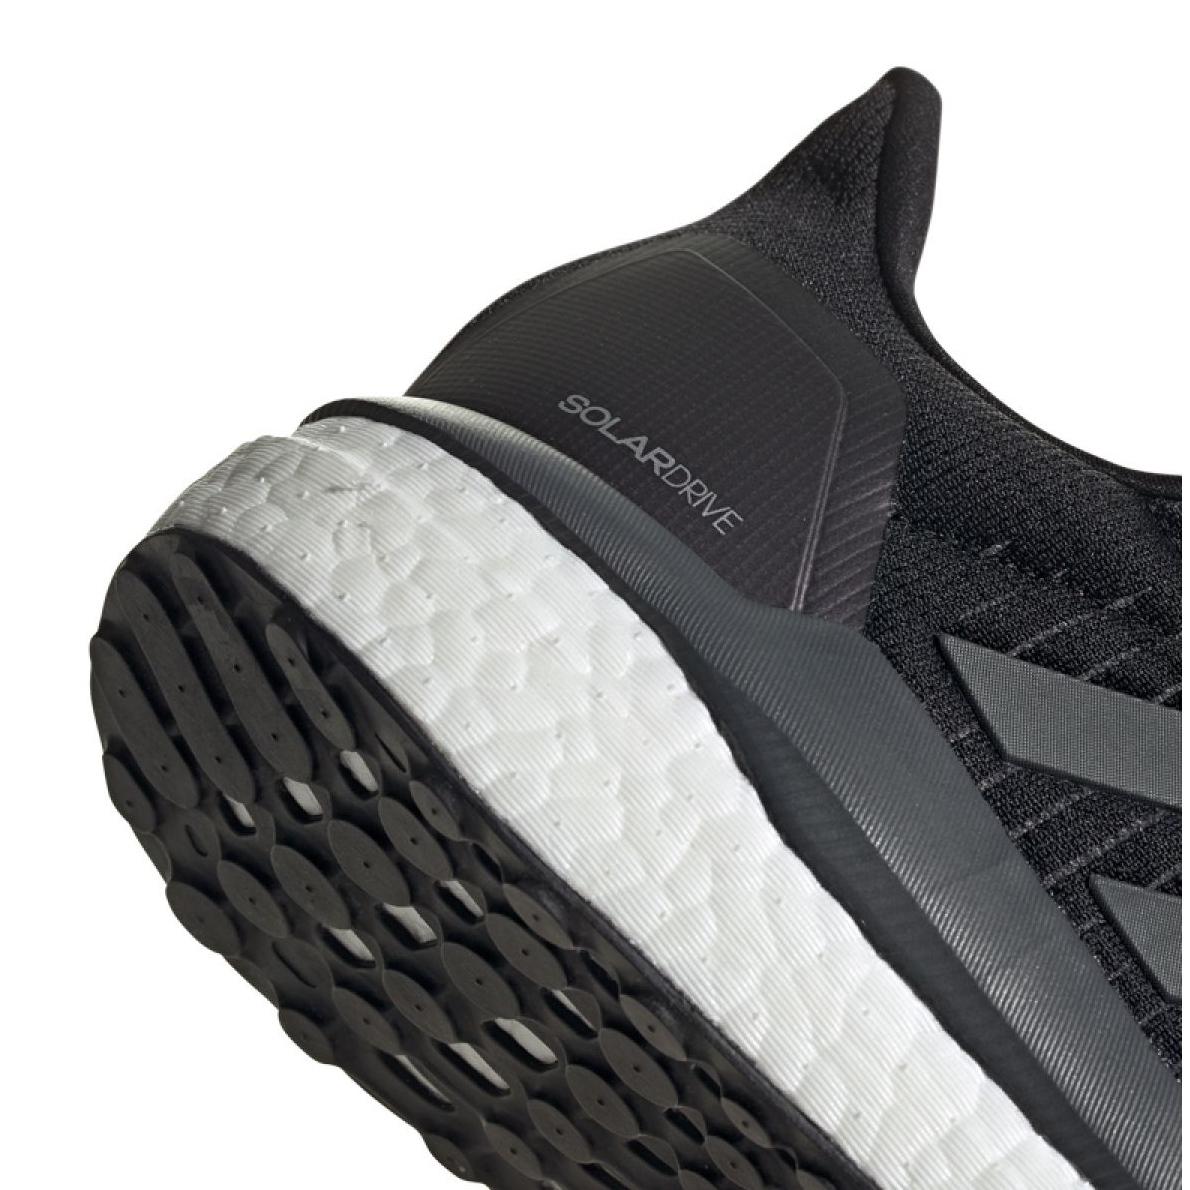 Adidas 19 Chaussures Solar Noir M Ef0789 De Drive Running 0O8PXnwk